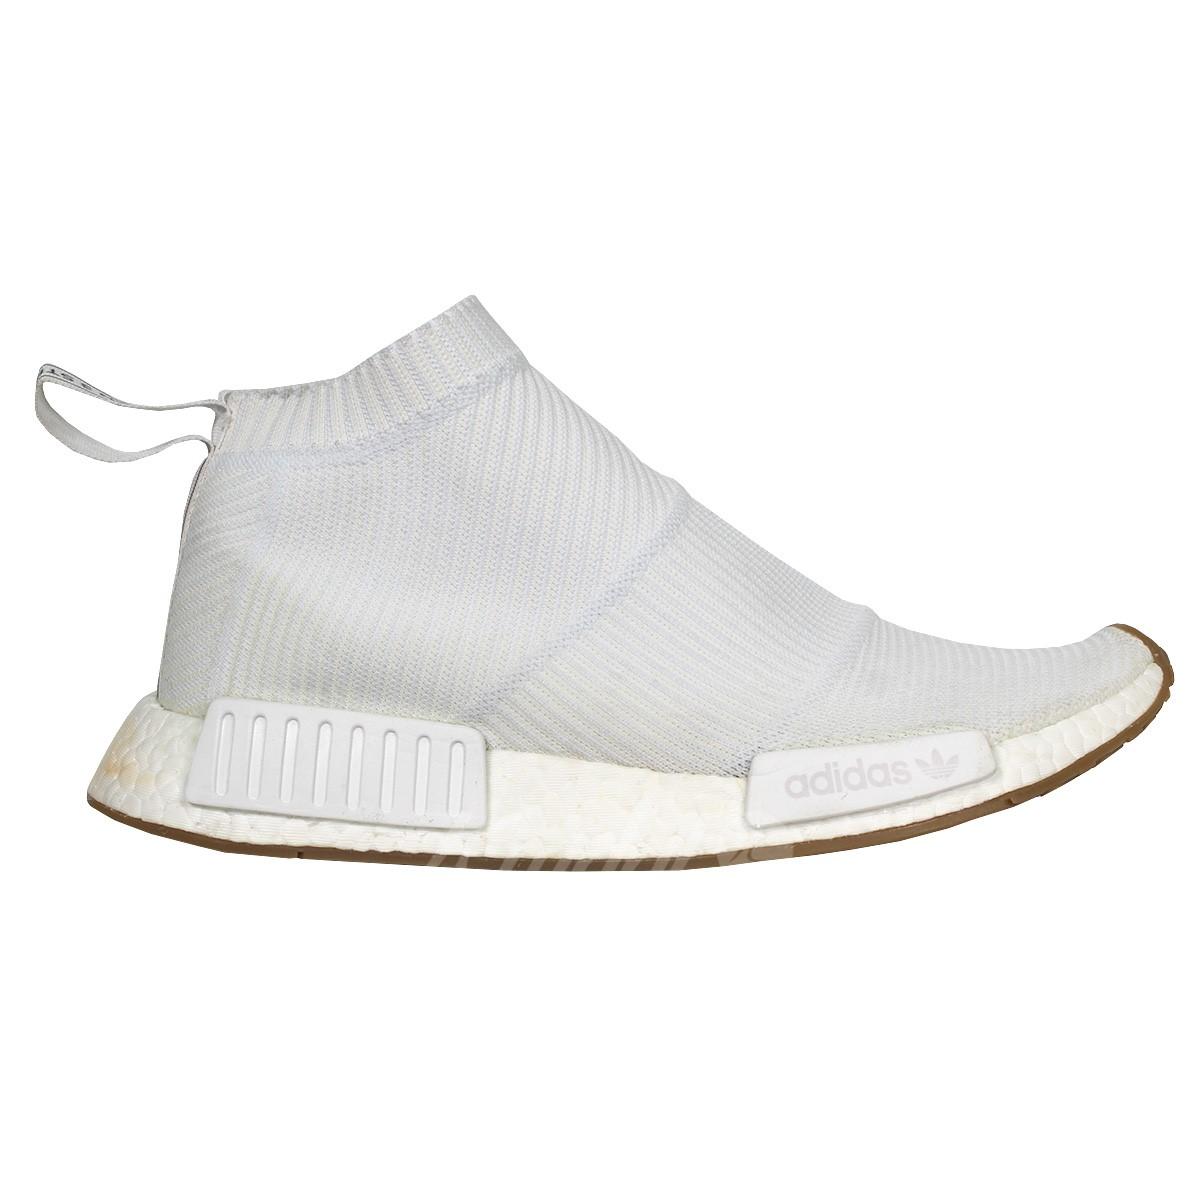 half off 47c93 42767 adidas NMD CS1 CITY SOCK PK higher frequency elimination socks knee car  white size: 28. 0cm (Adidas)